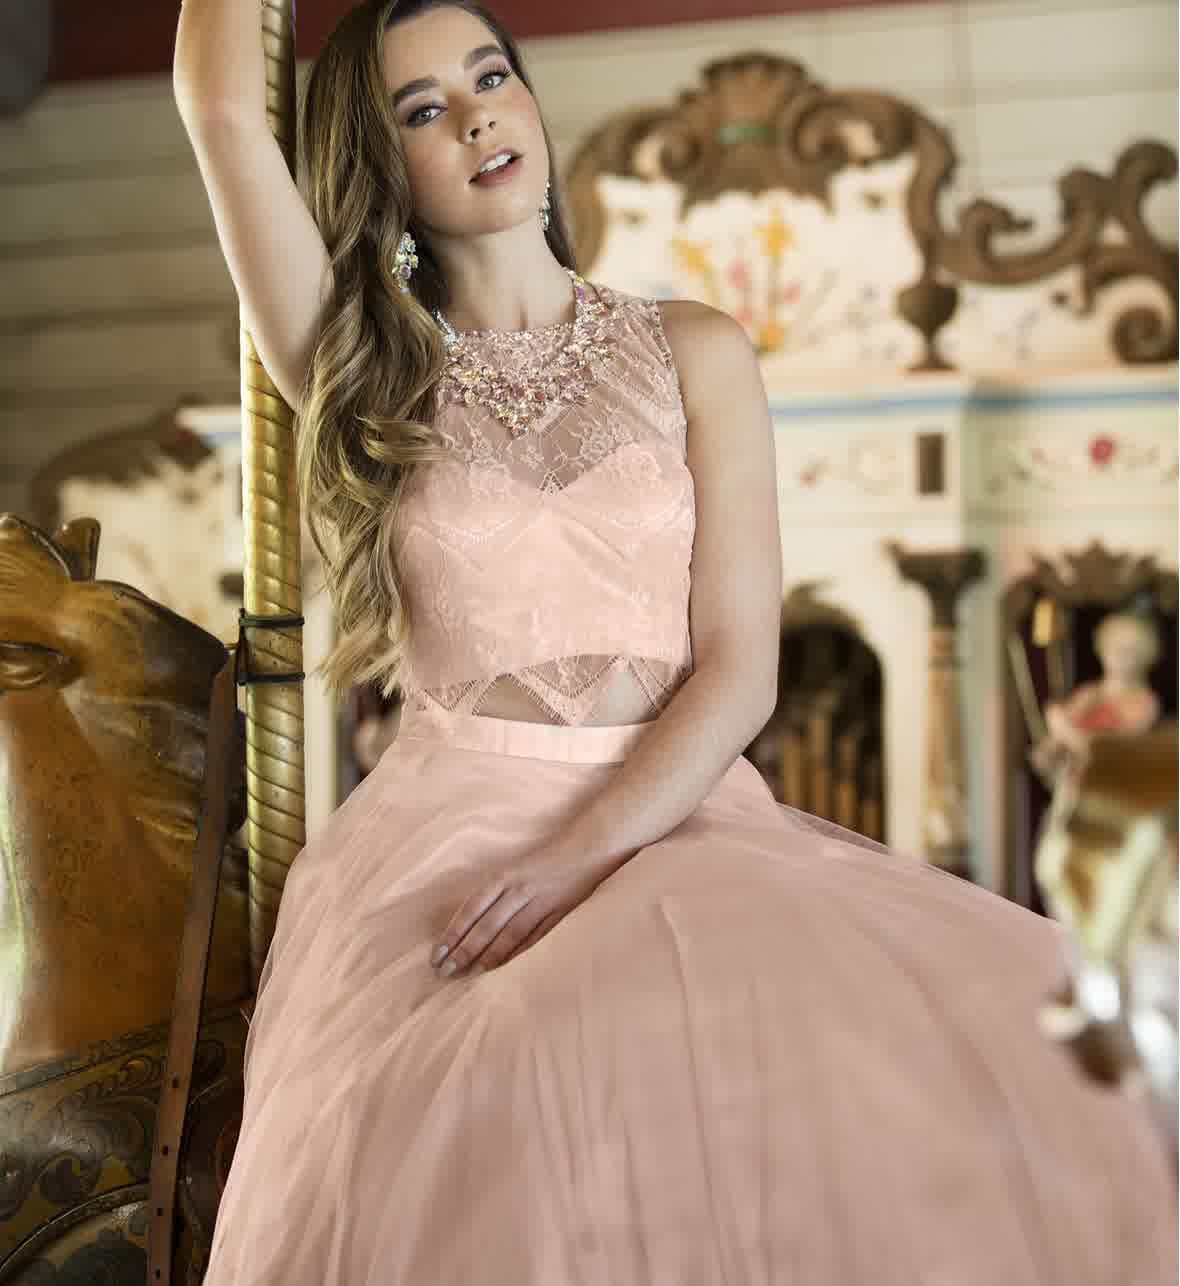 Shabby Chic Pastel Romantic Prom Dresses